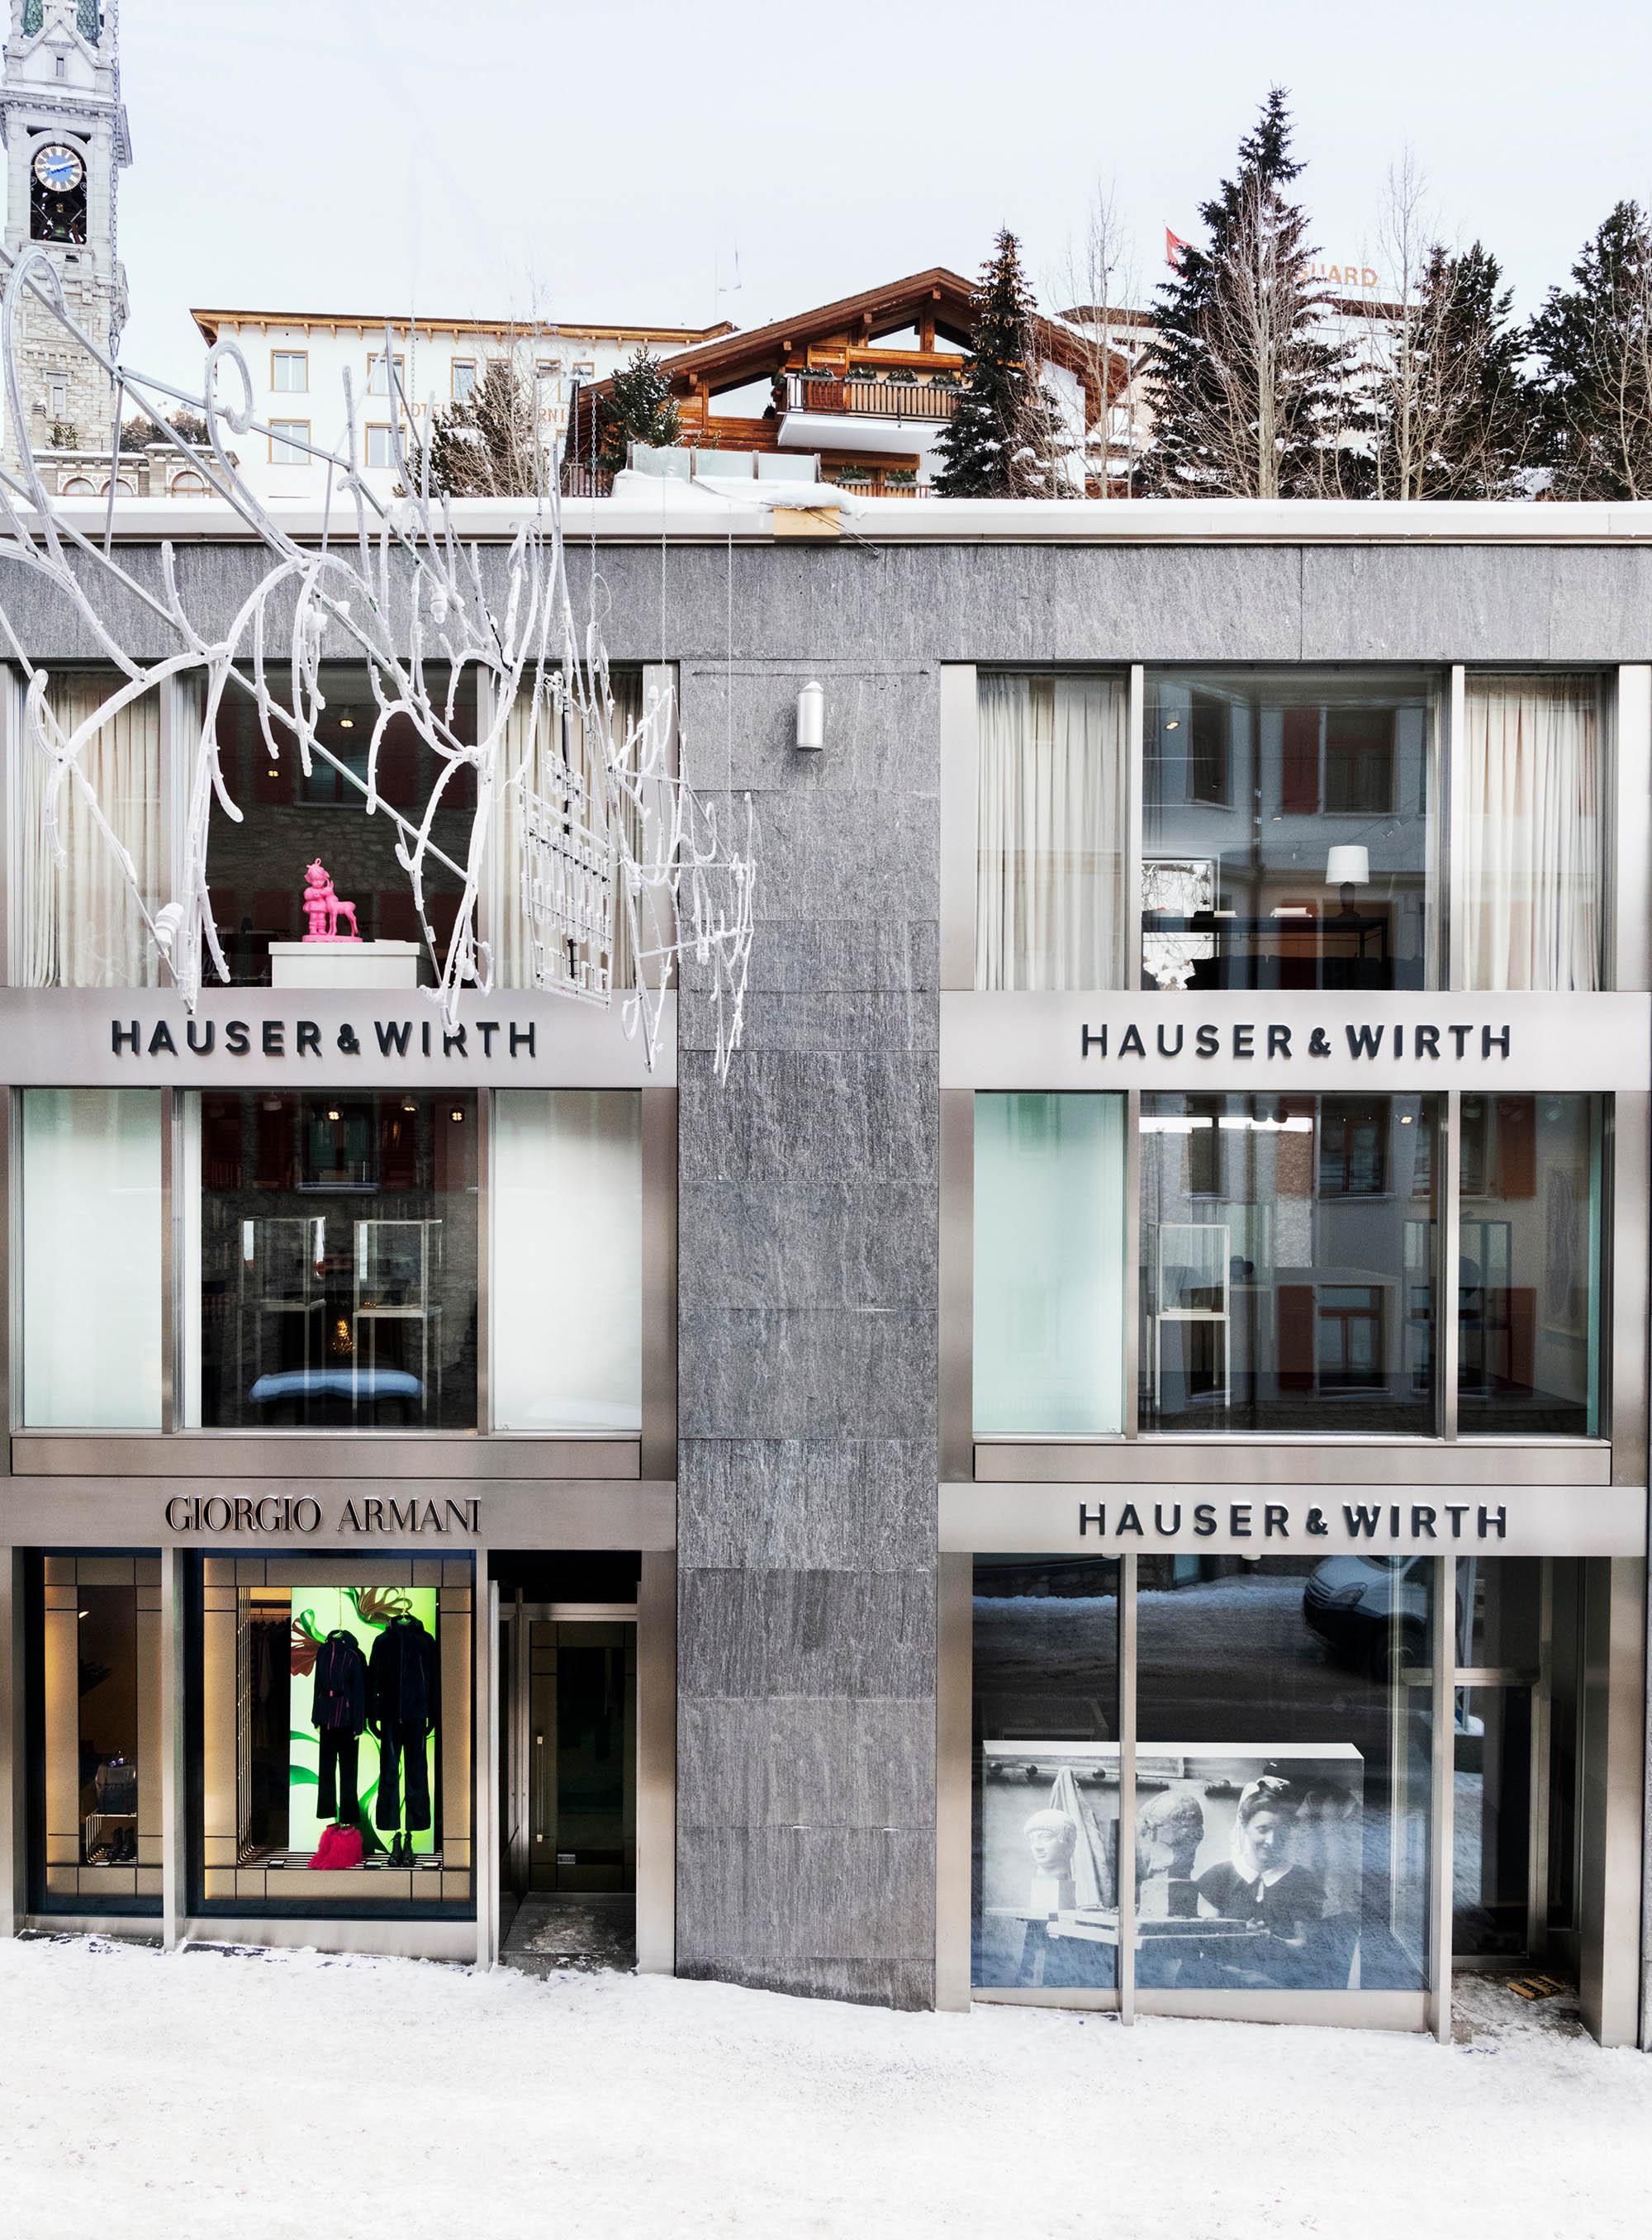 luis_laplace-Hauser_Wirth_St_Moritz-1